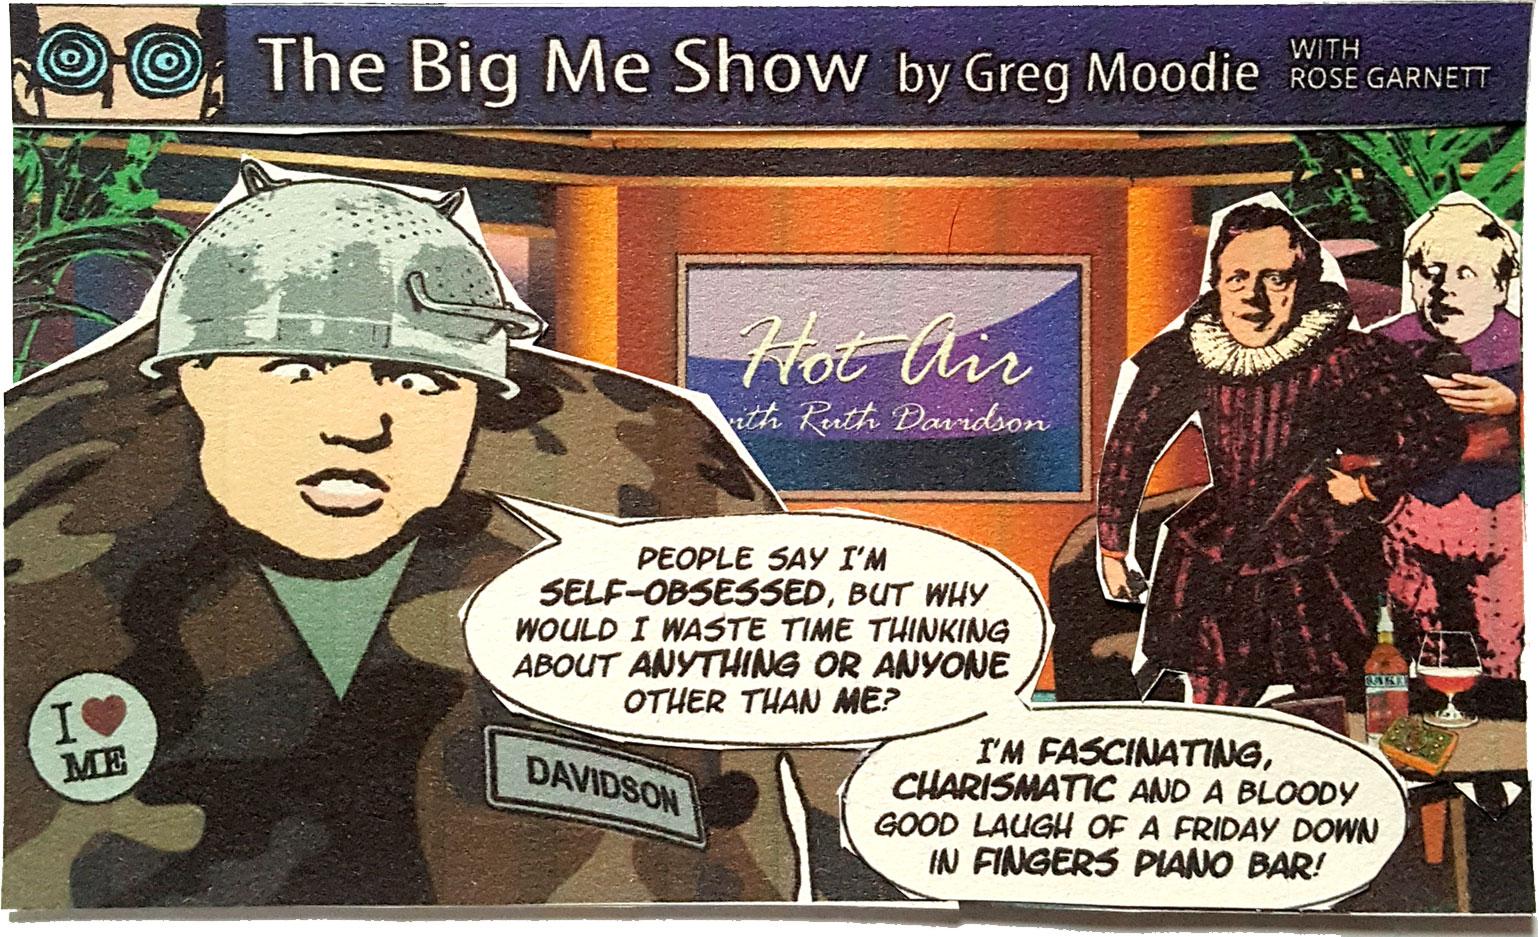 The Big Me Show